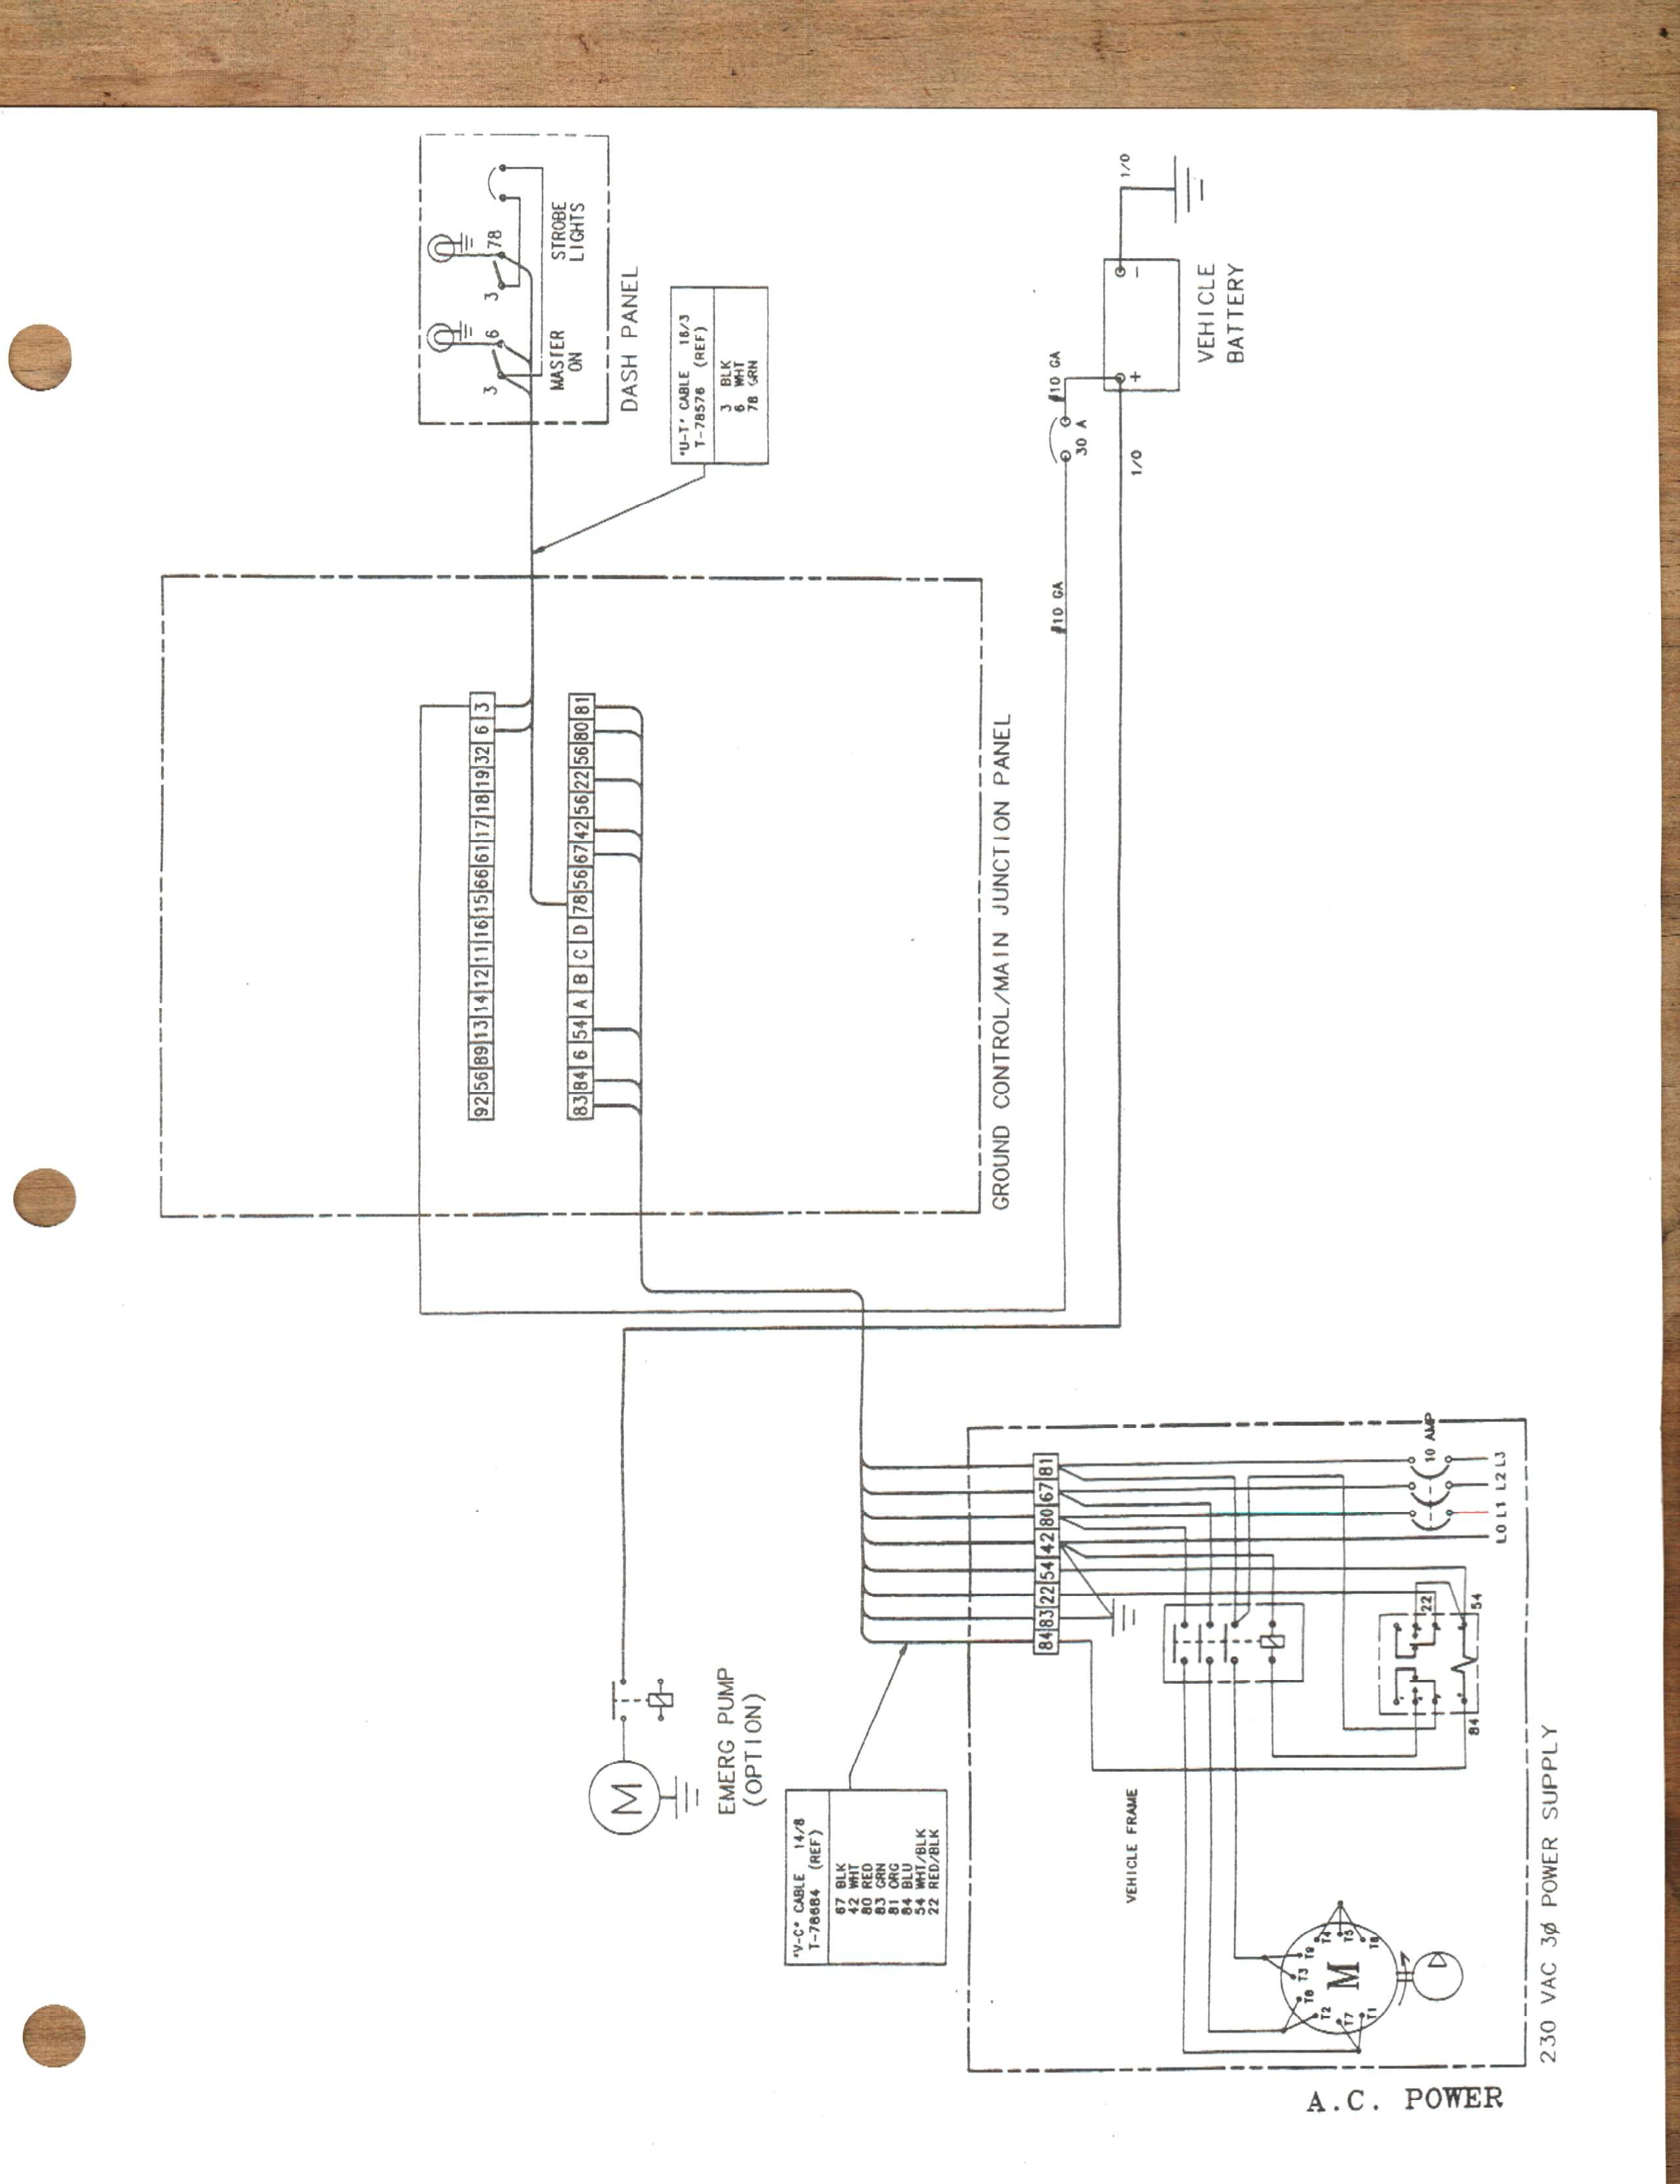 Altec Bucket Trucks Wiring Diagrams - Www.casei.store • on columbia wiring diagram, advent wiring diagram, astec wiring diagram, dynapac wiring diagram, ditch witch wiring diagram, panasonic wiring diagram, toshiba wiring diagram, atlas wiring diagram, apc wiring diagram, bomag wiring diagram, liebherr wiring diagram, american wiring diagram, clark wiring diagram, fecon wiring diagram, autocar wiring diagram, taylor wiring diagram, apple wiring diagram, asus wiring diagram, fontaine wiring diagram, ace wiring diagram,